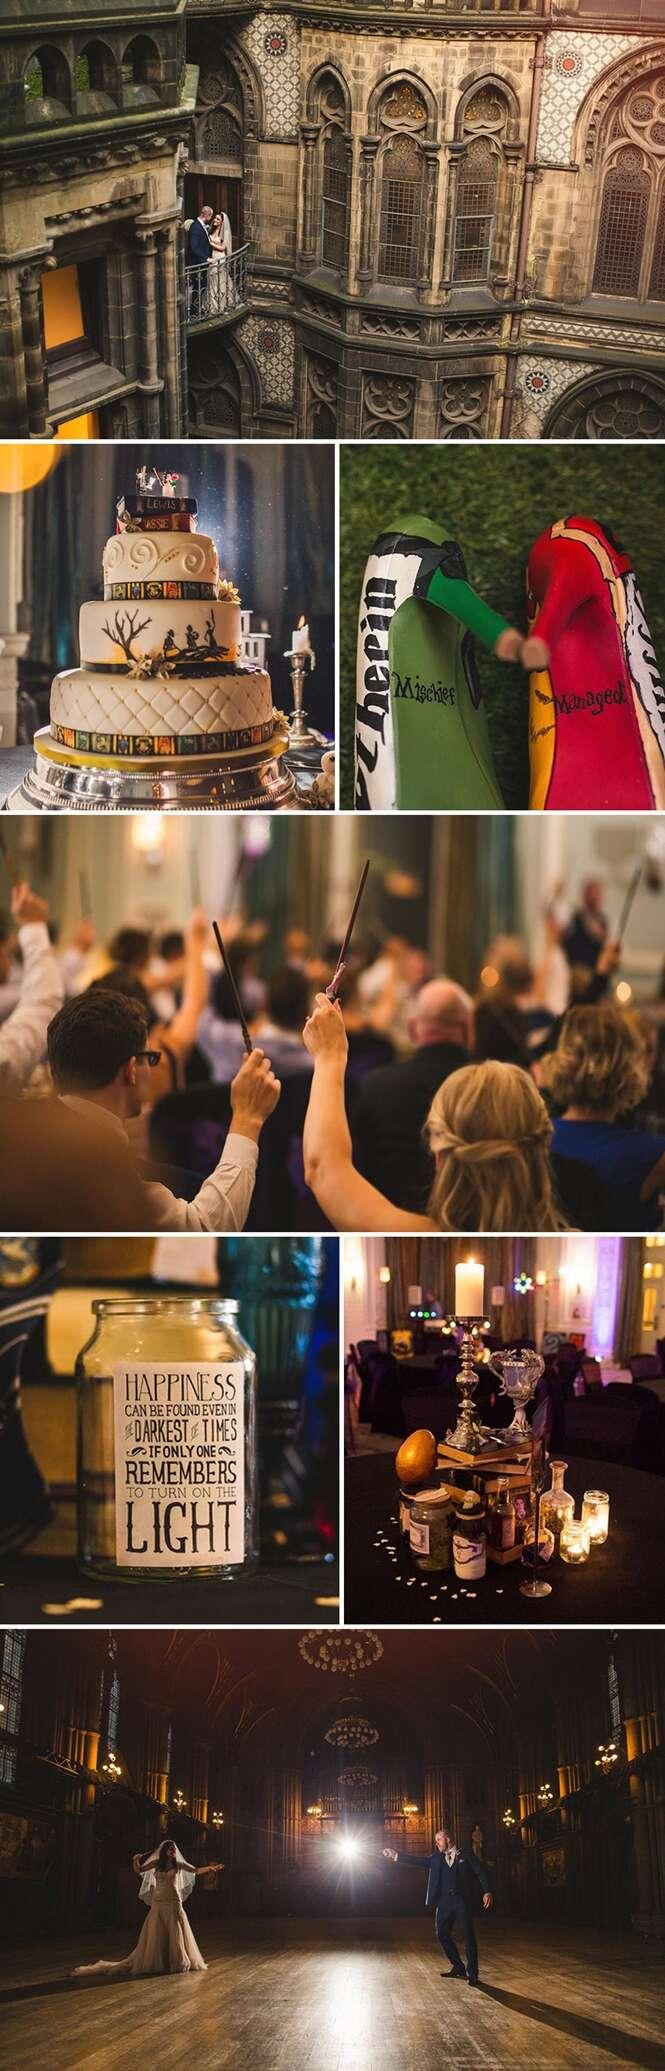 Fotos divertidas de casamentos Geek's